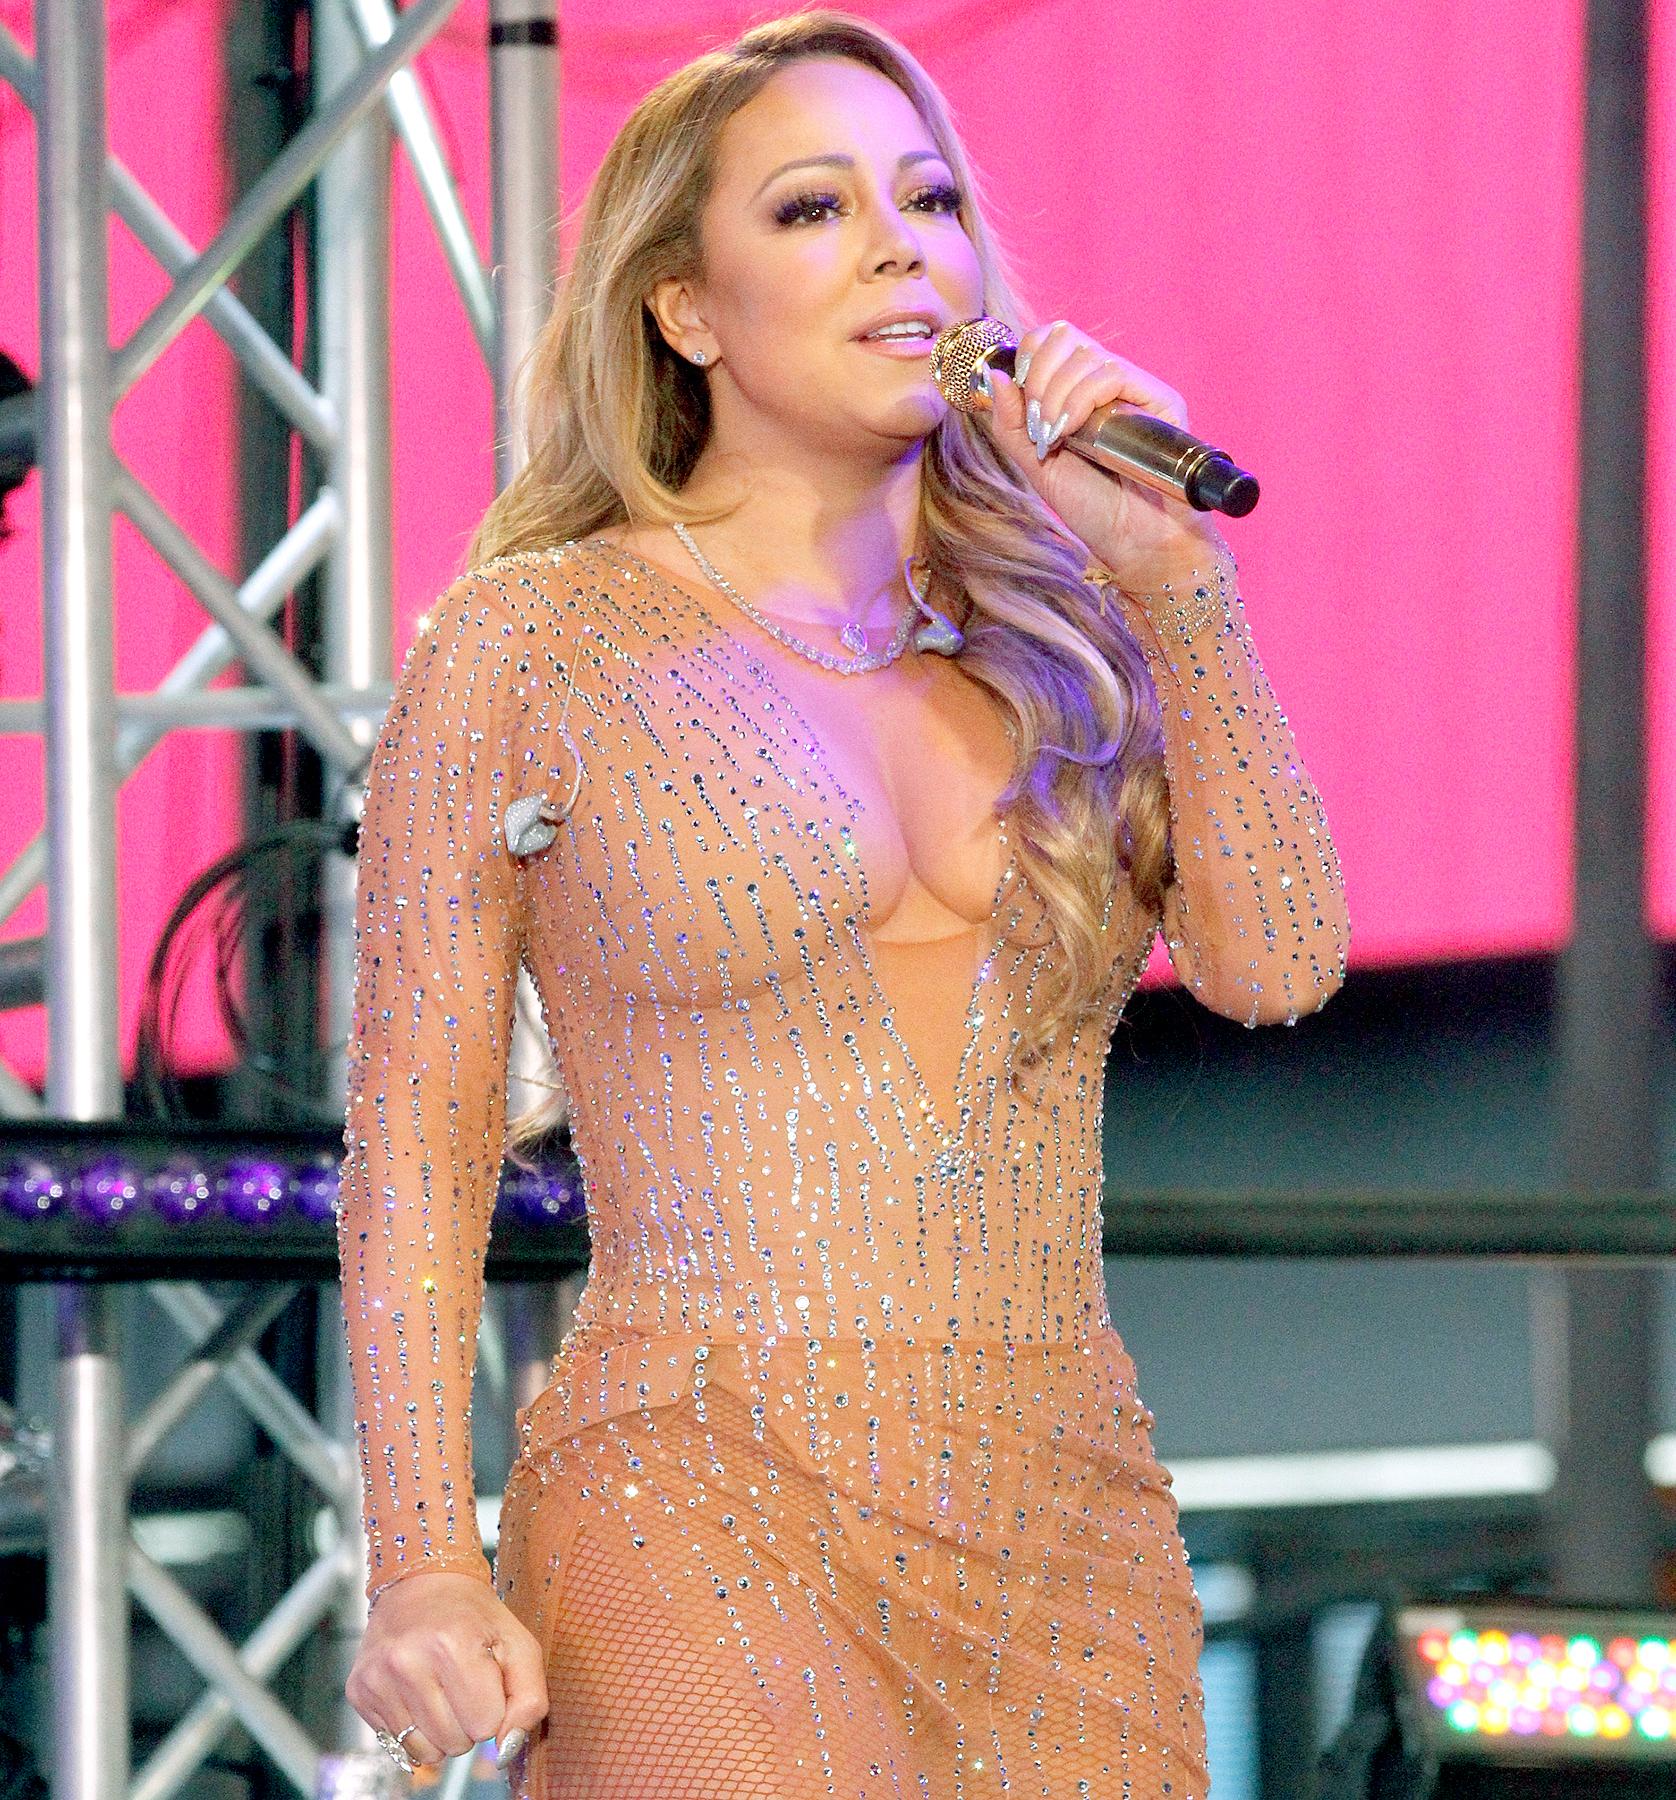 Mariah Carey on New Years Rockin Eve with Ryan Seacrest 2017